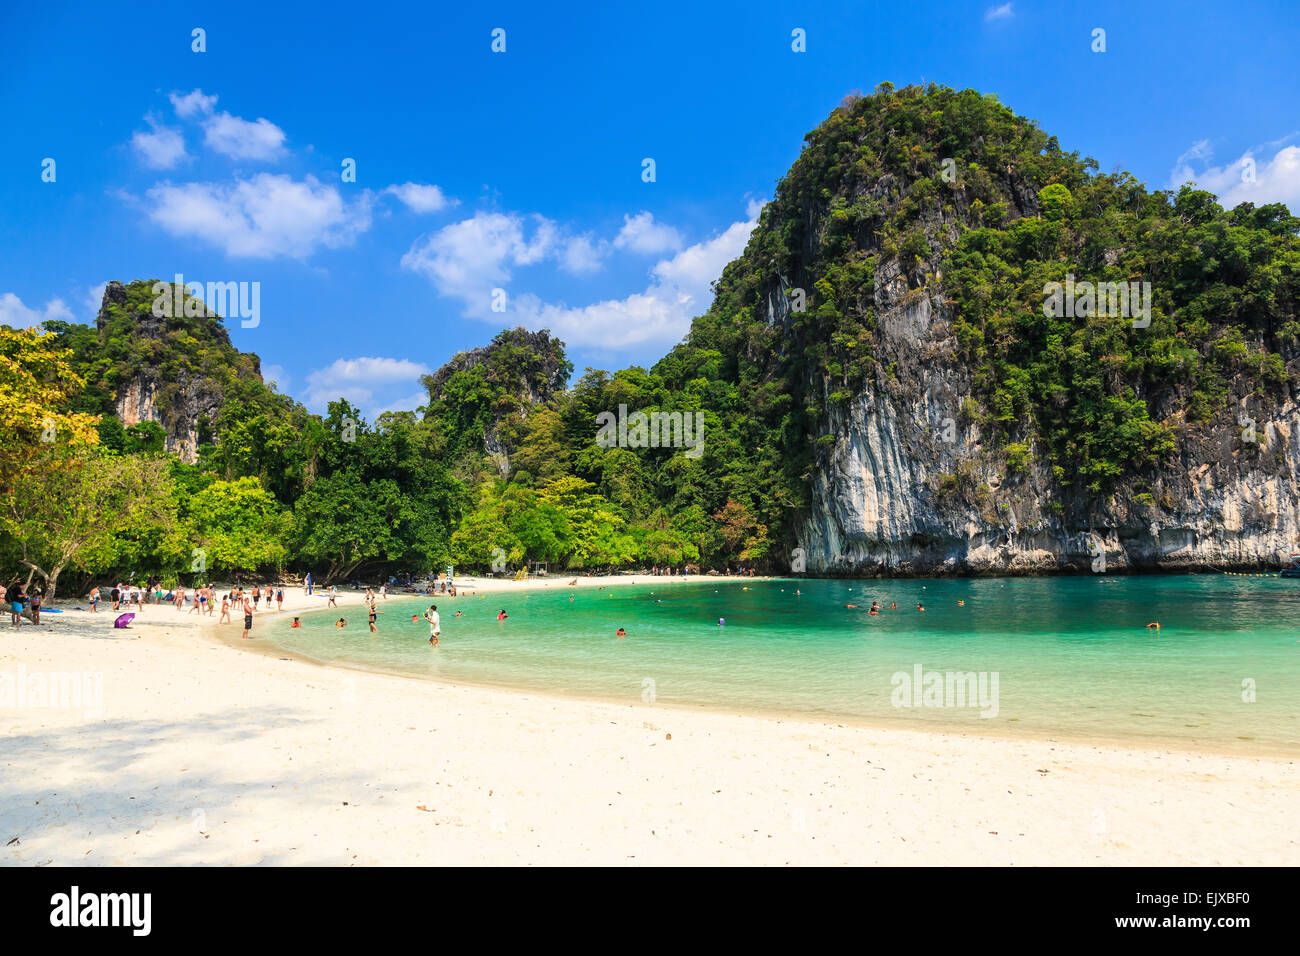 Hong Island lagoon. Krabi province, Thailand Stock Photo, Royalty Free Image:...